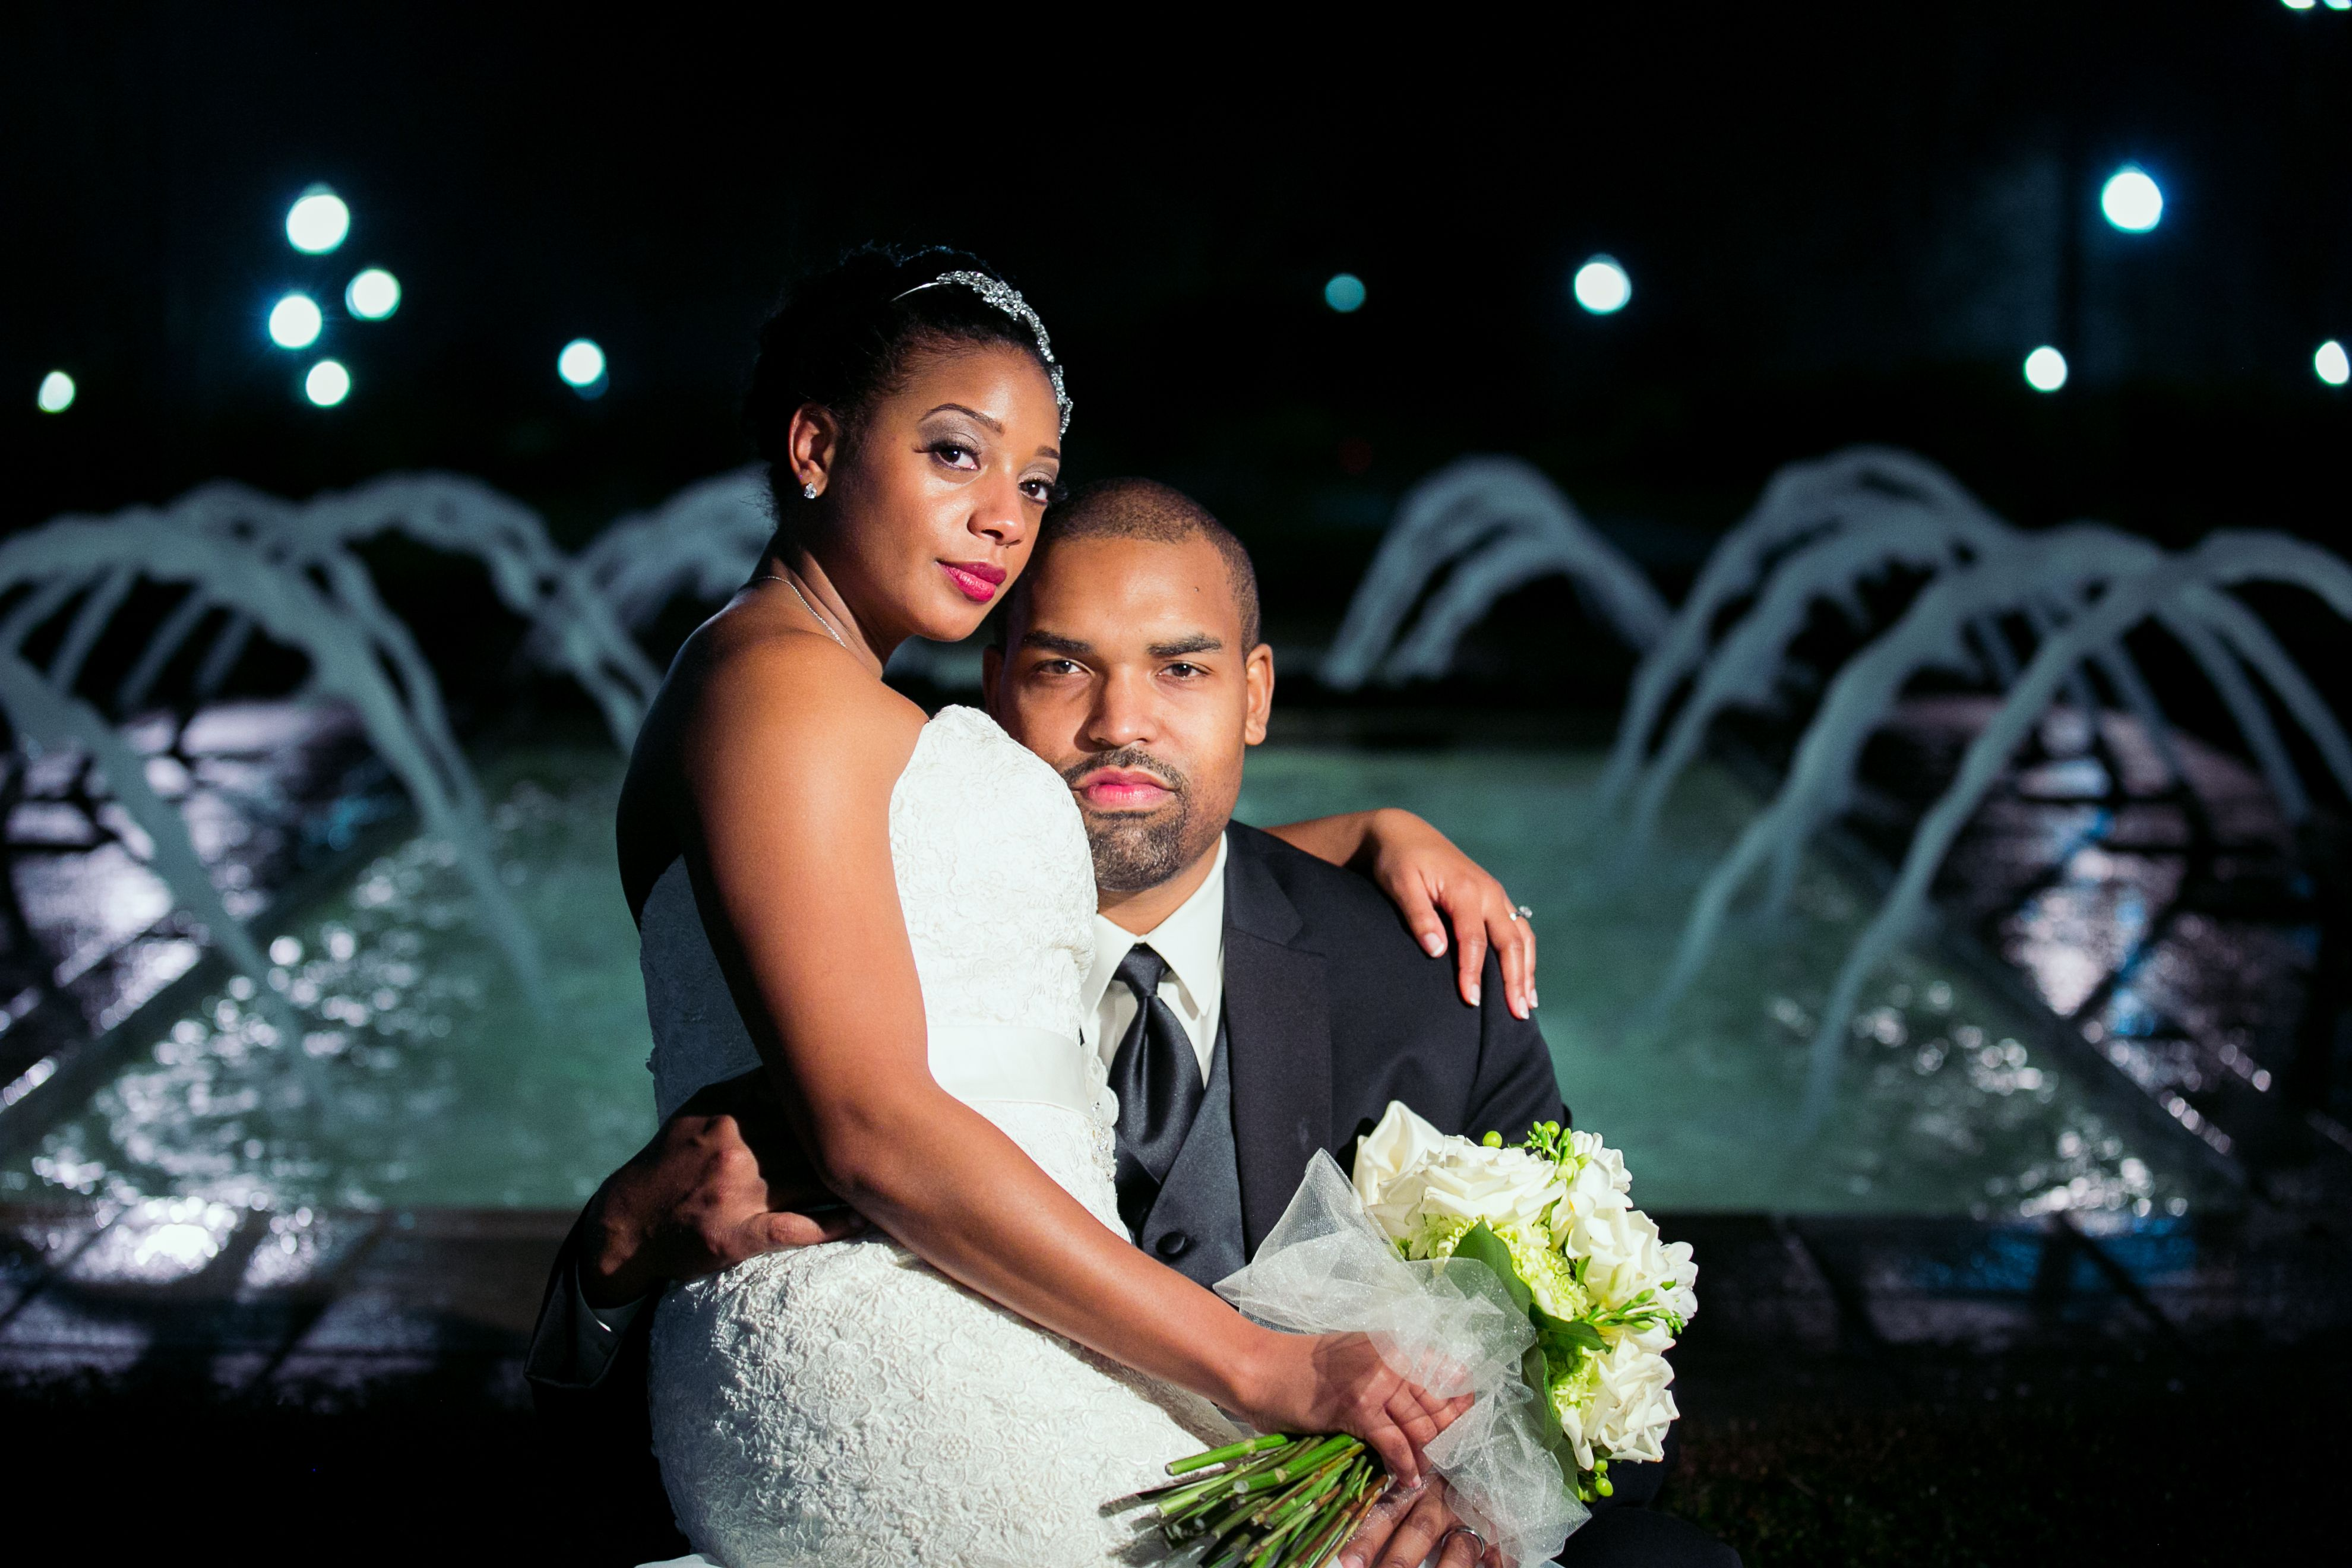 #theluxuryweddingsource, #GOWS, #weddingstyle Grace Ormonde Wedding Style Cover Option 5